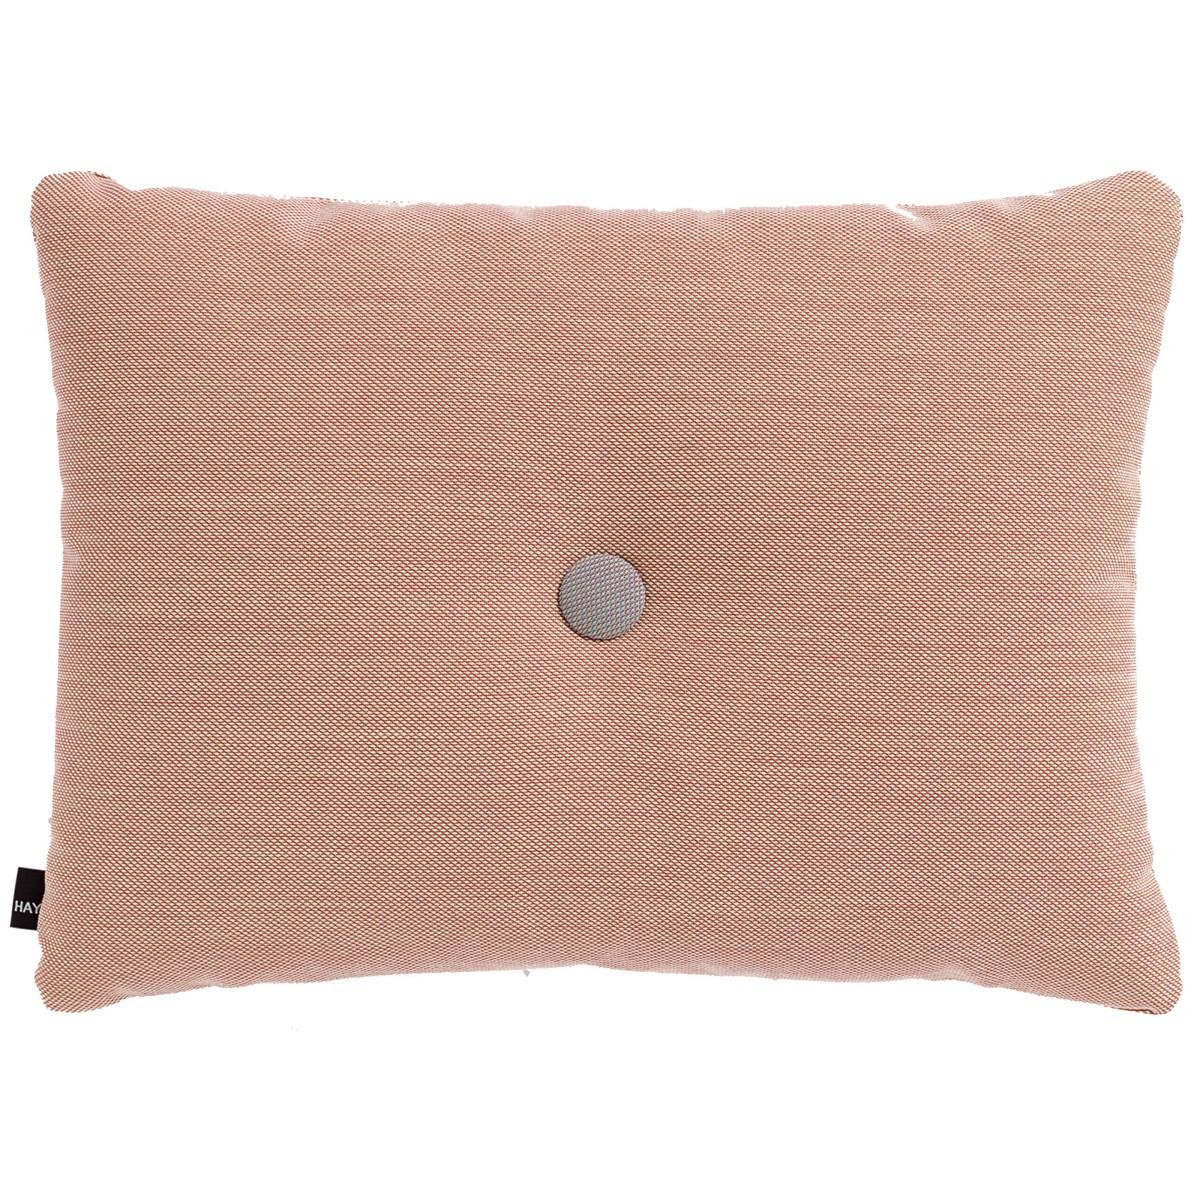 https://www.fundesign.nl/media/catalog/product/h/a/hay-dot-cushion-steelcut-trio-rose.jpg